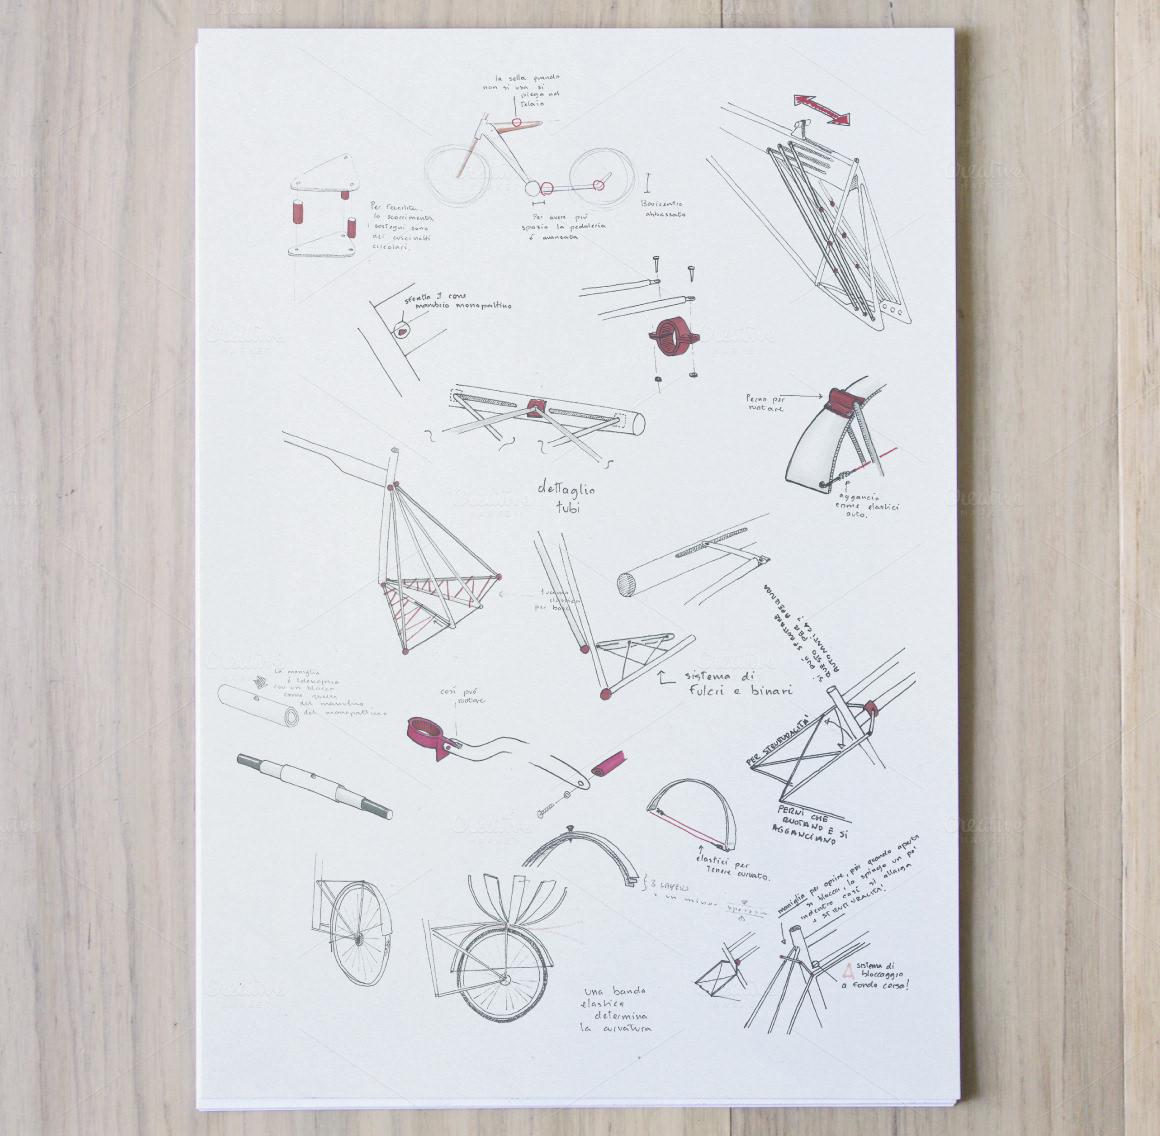 vertical a4 size paper mockup ideas